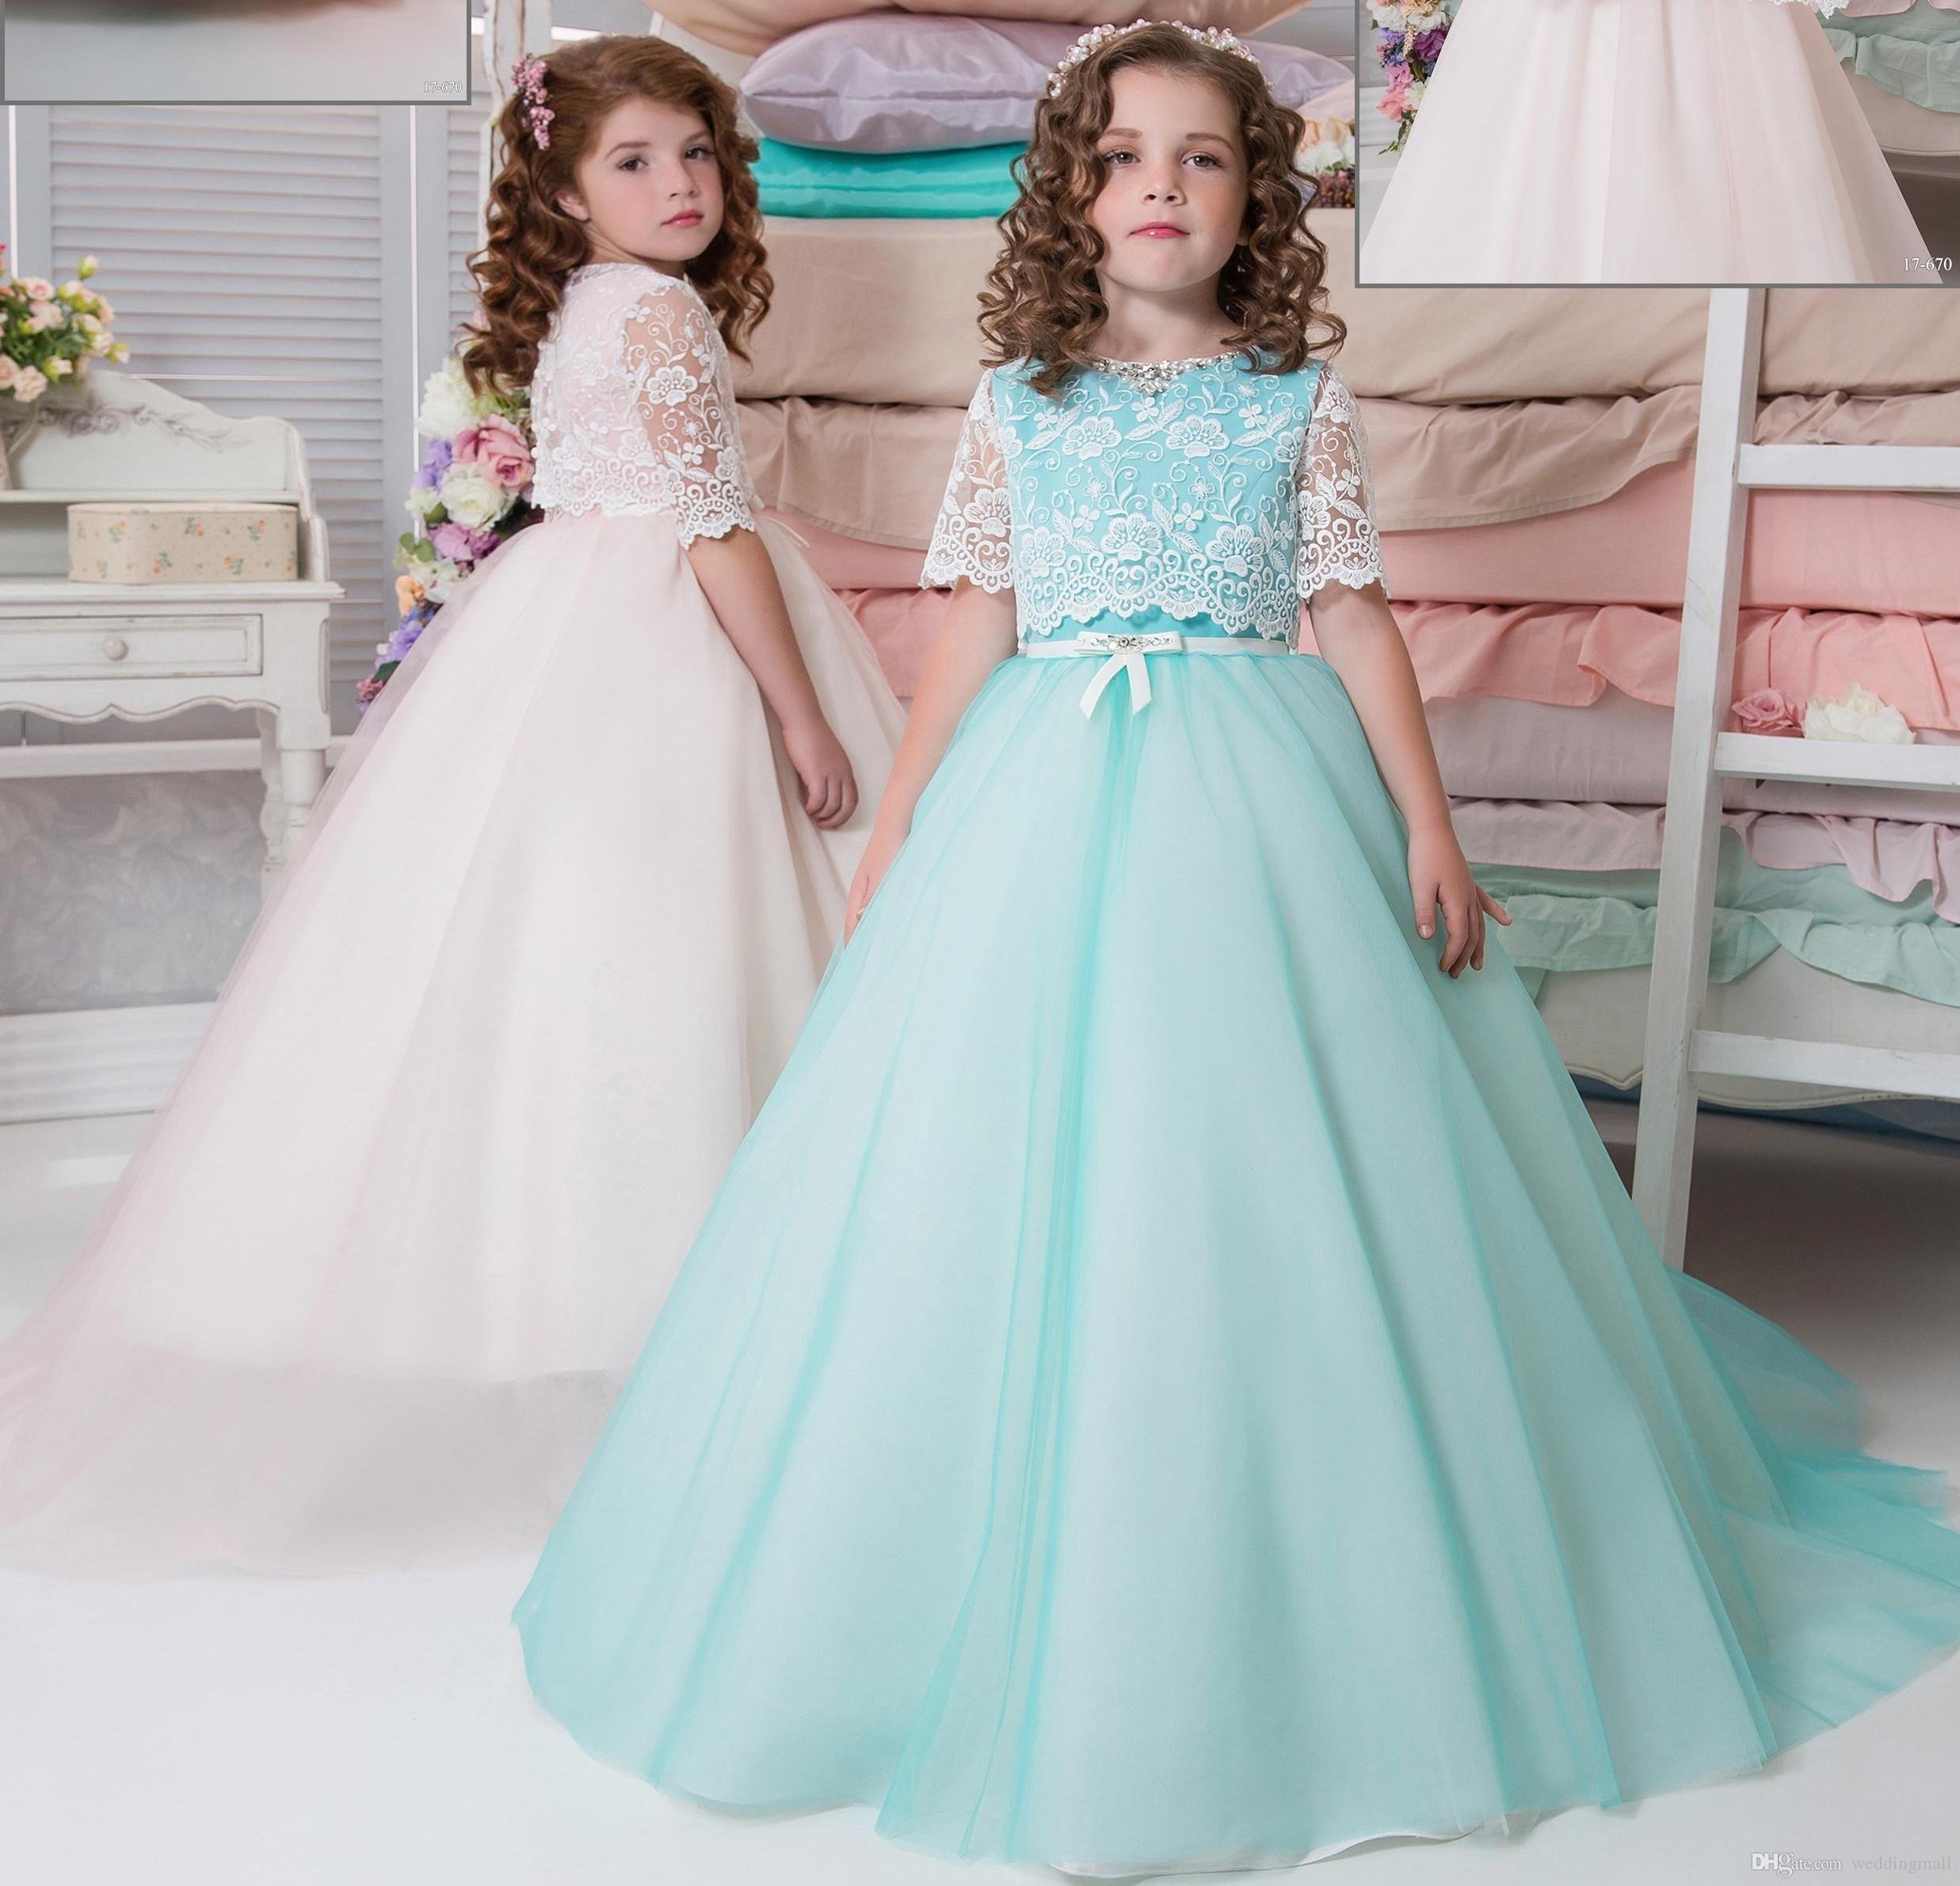 New Off The Shoulder Cute Flower Girl Dresses For Wedding 2017 ...